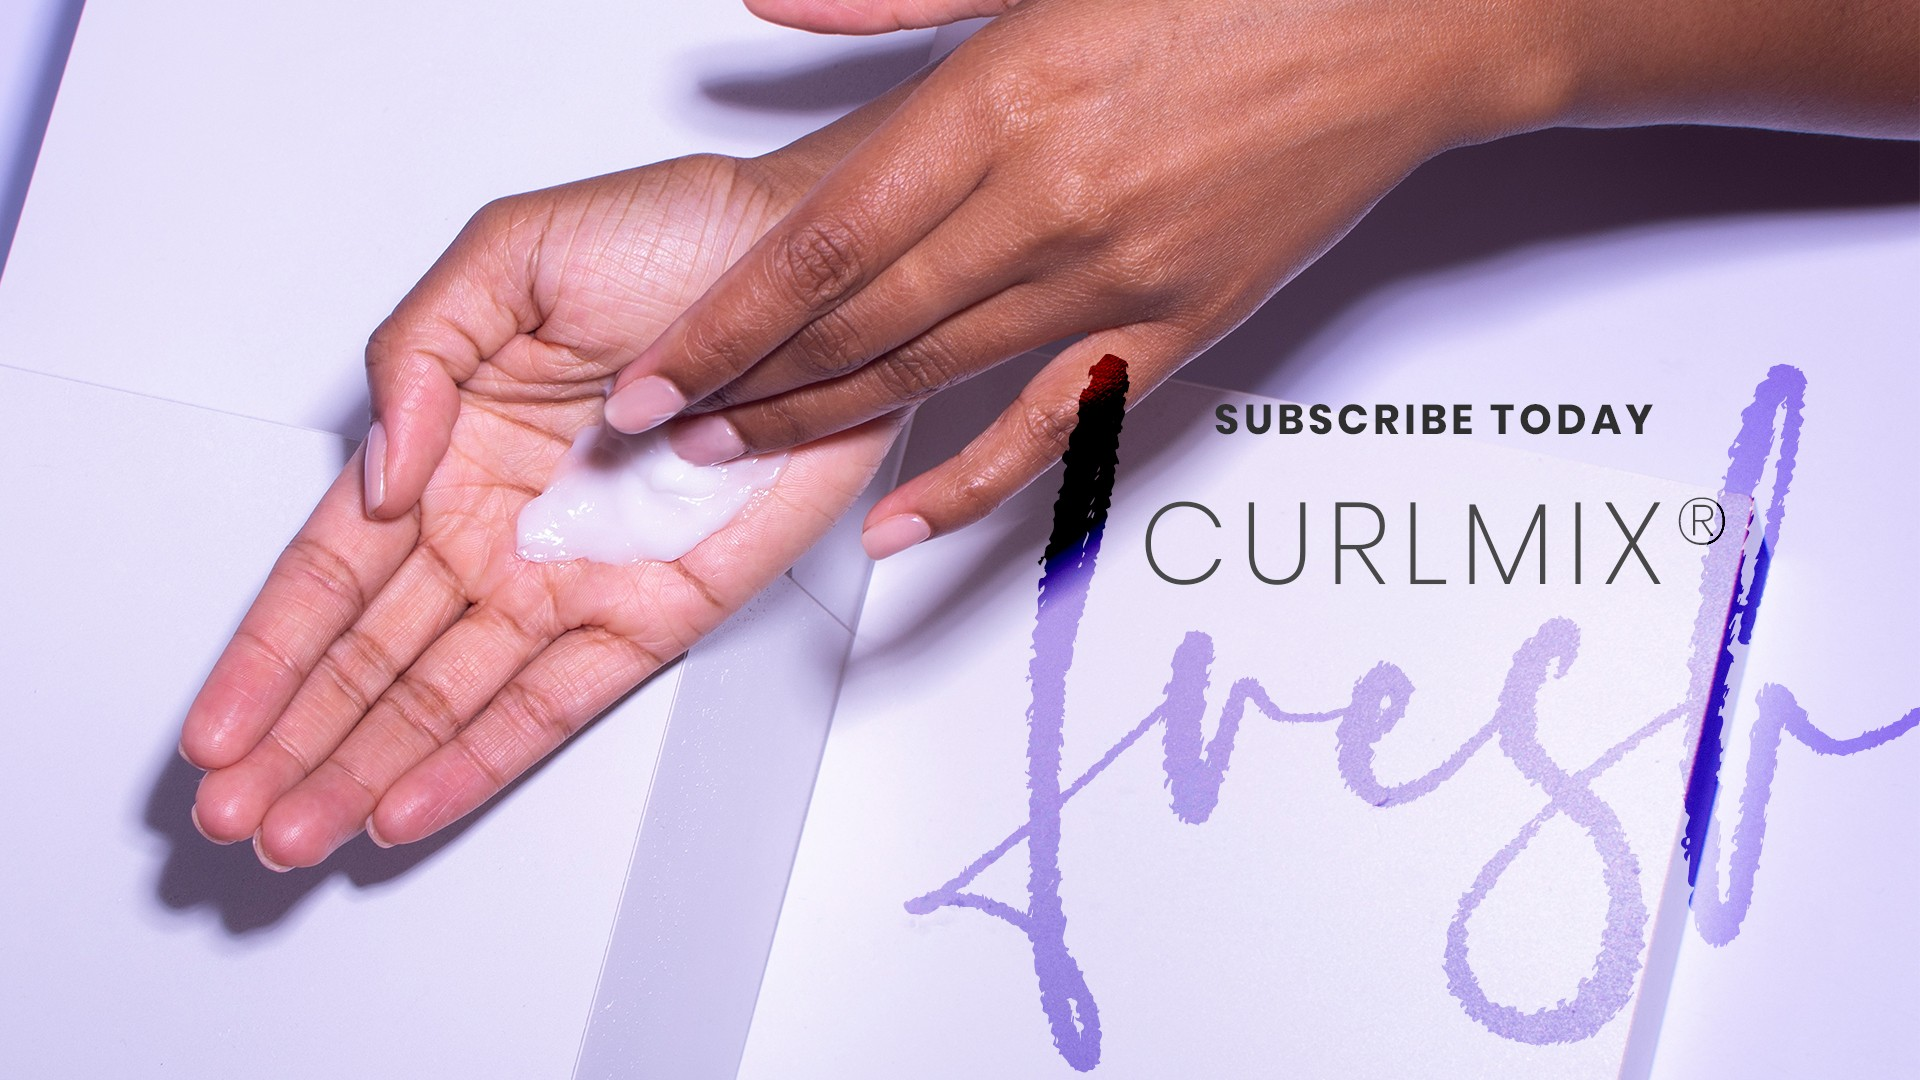 CurlMix Fresh